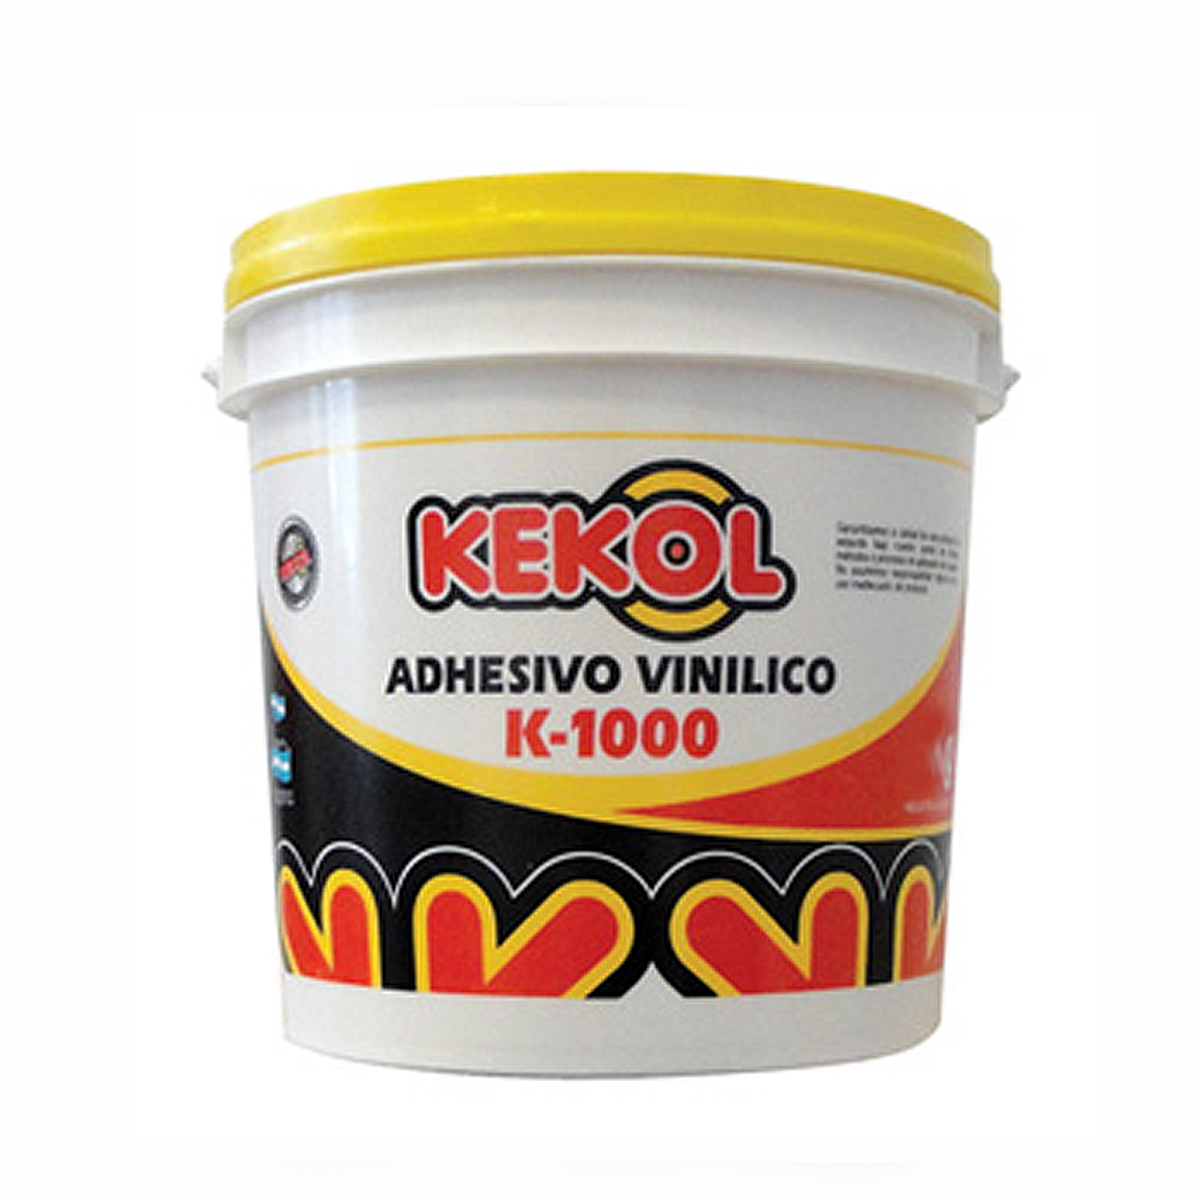 ADHESIVO VINILICO K 1000/10 KG